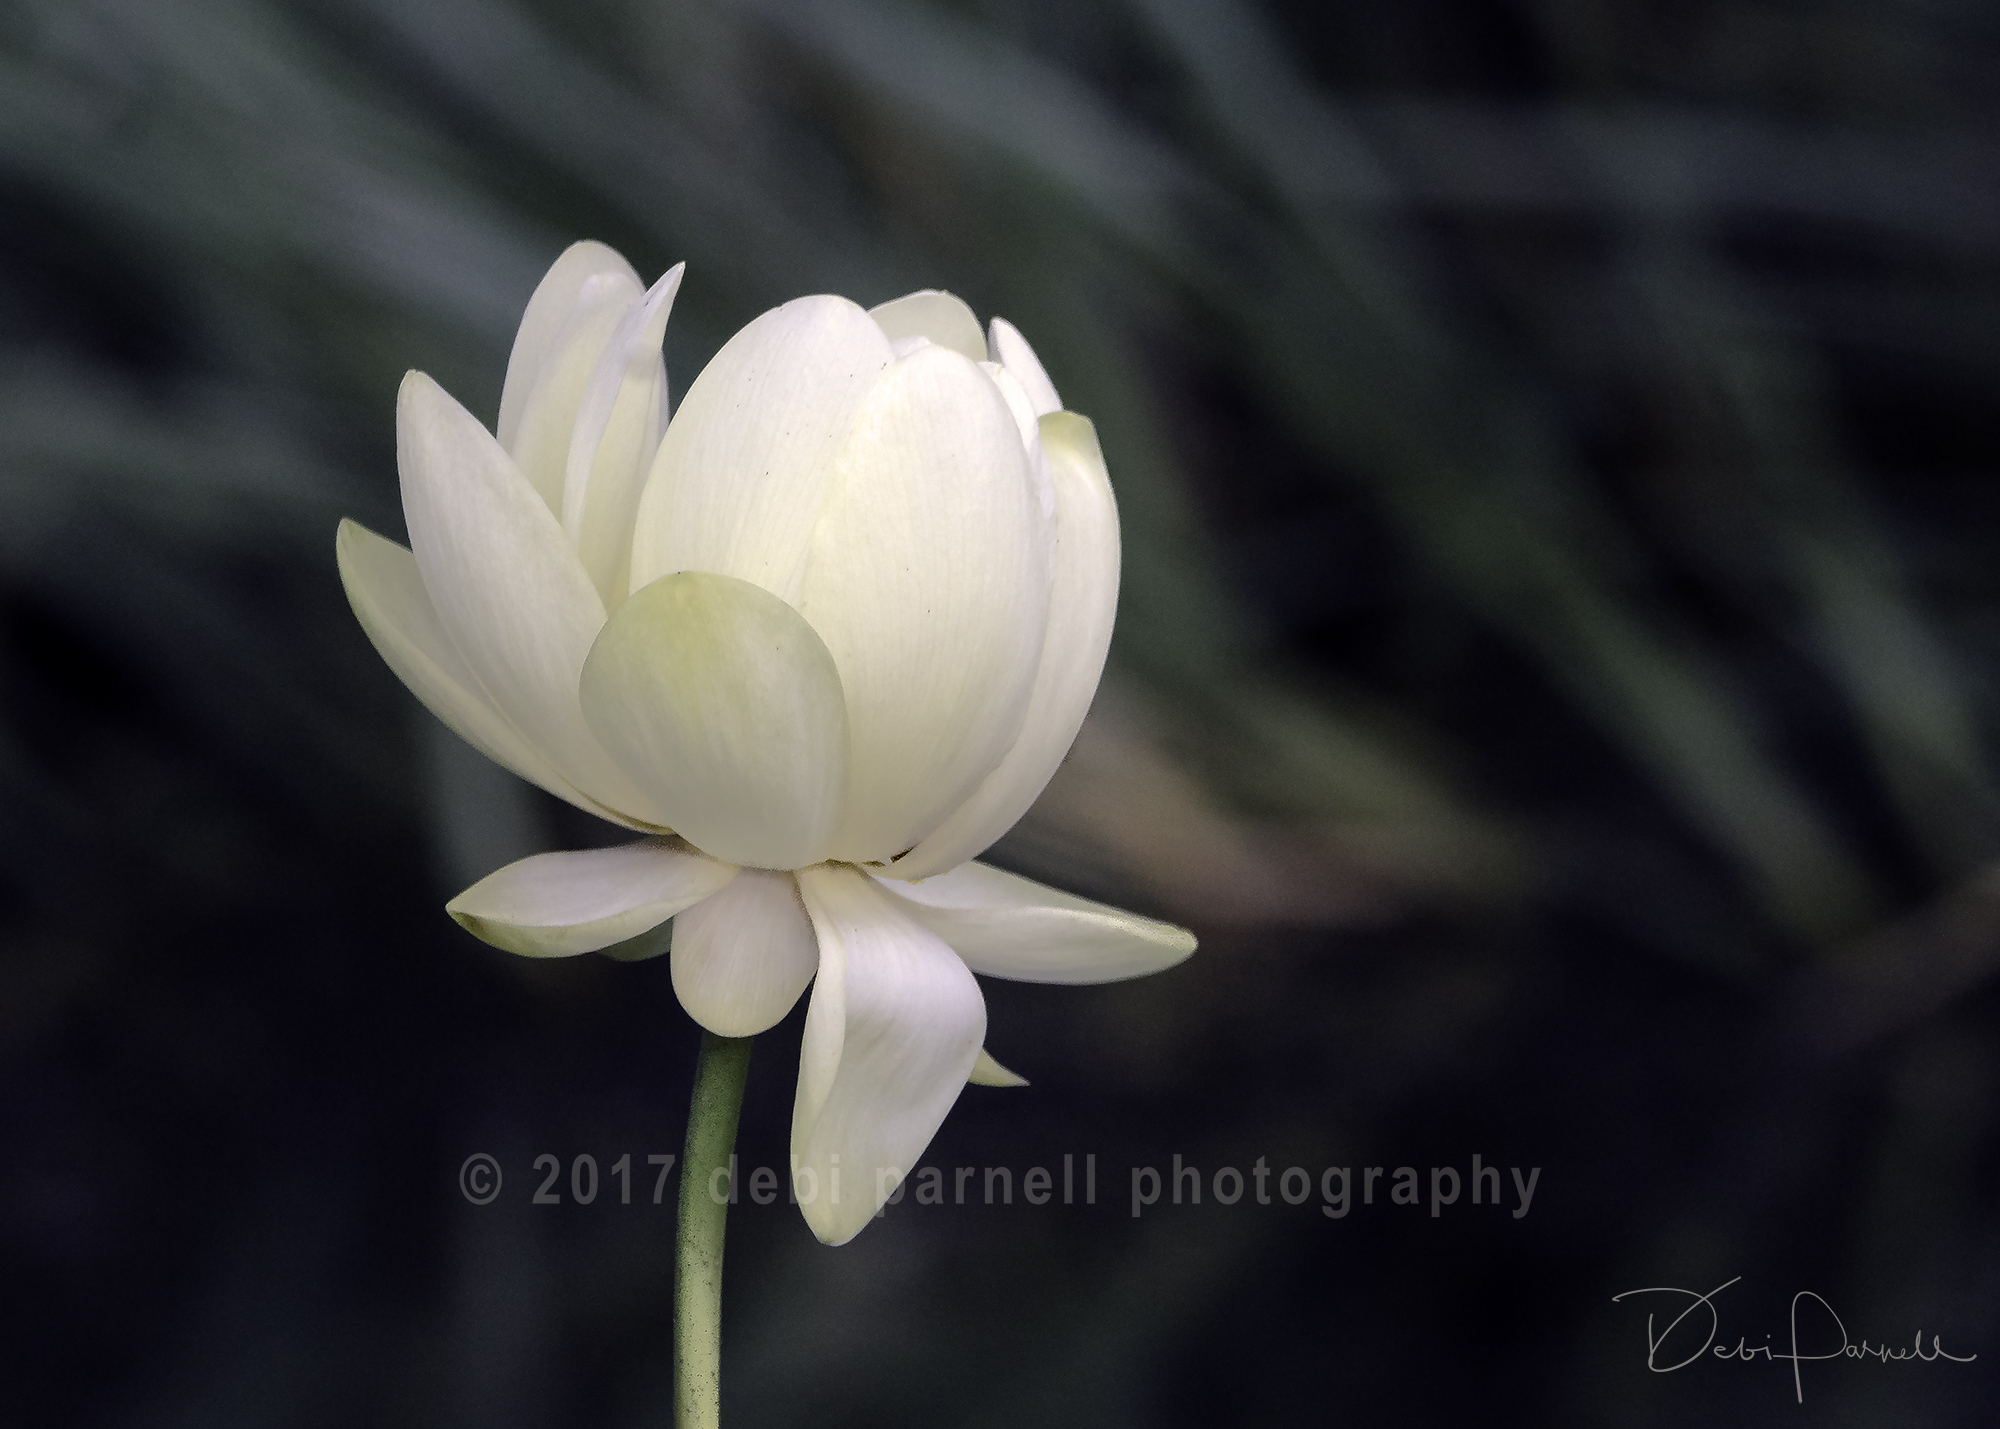 Copy of Lone Lily FL-007